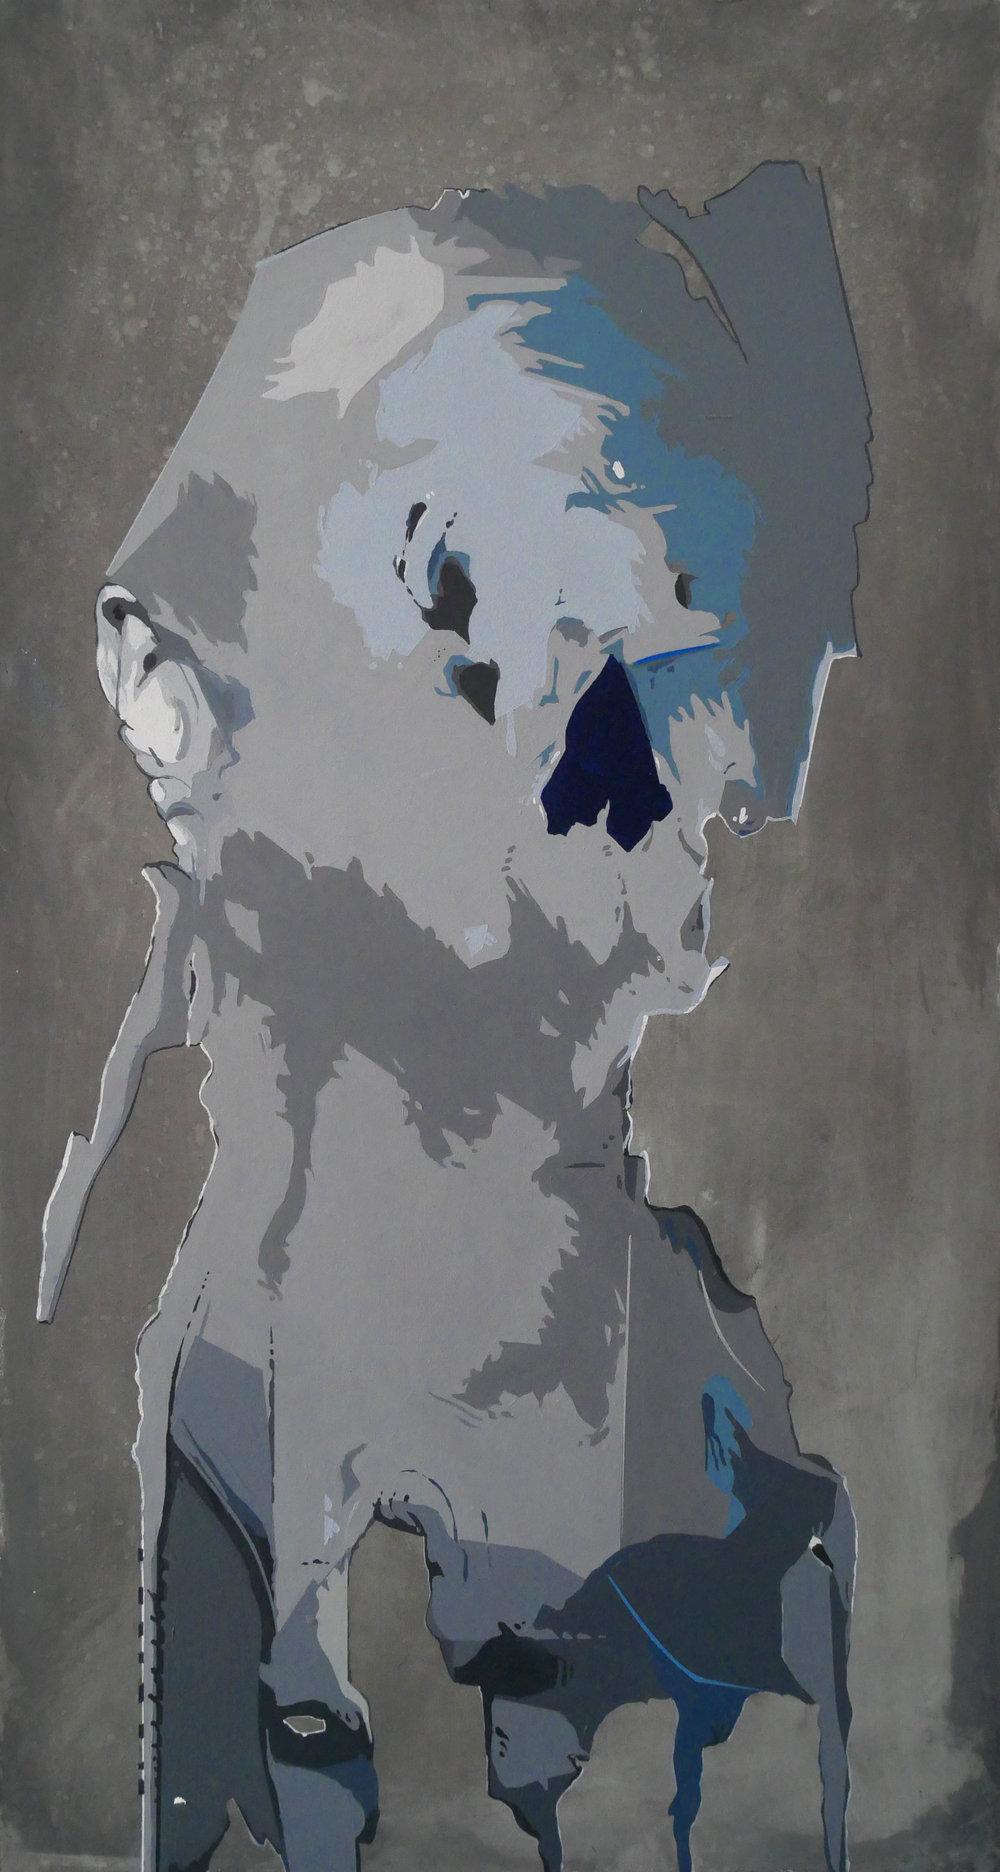 Phantom Study   2017 Acrylic on wood panel 24 x 12.8 in 61 x 32.5 cm